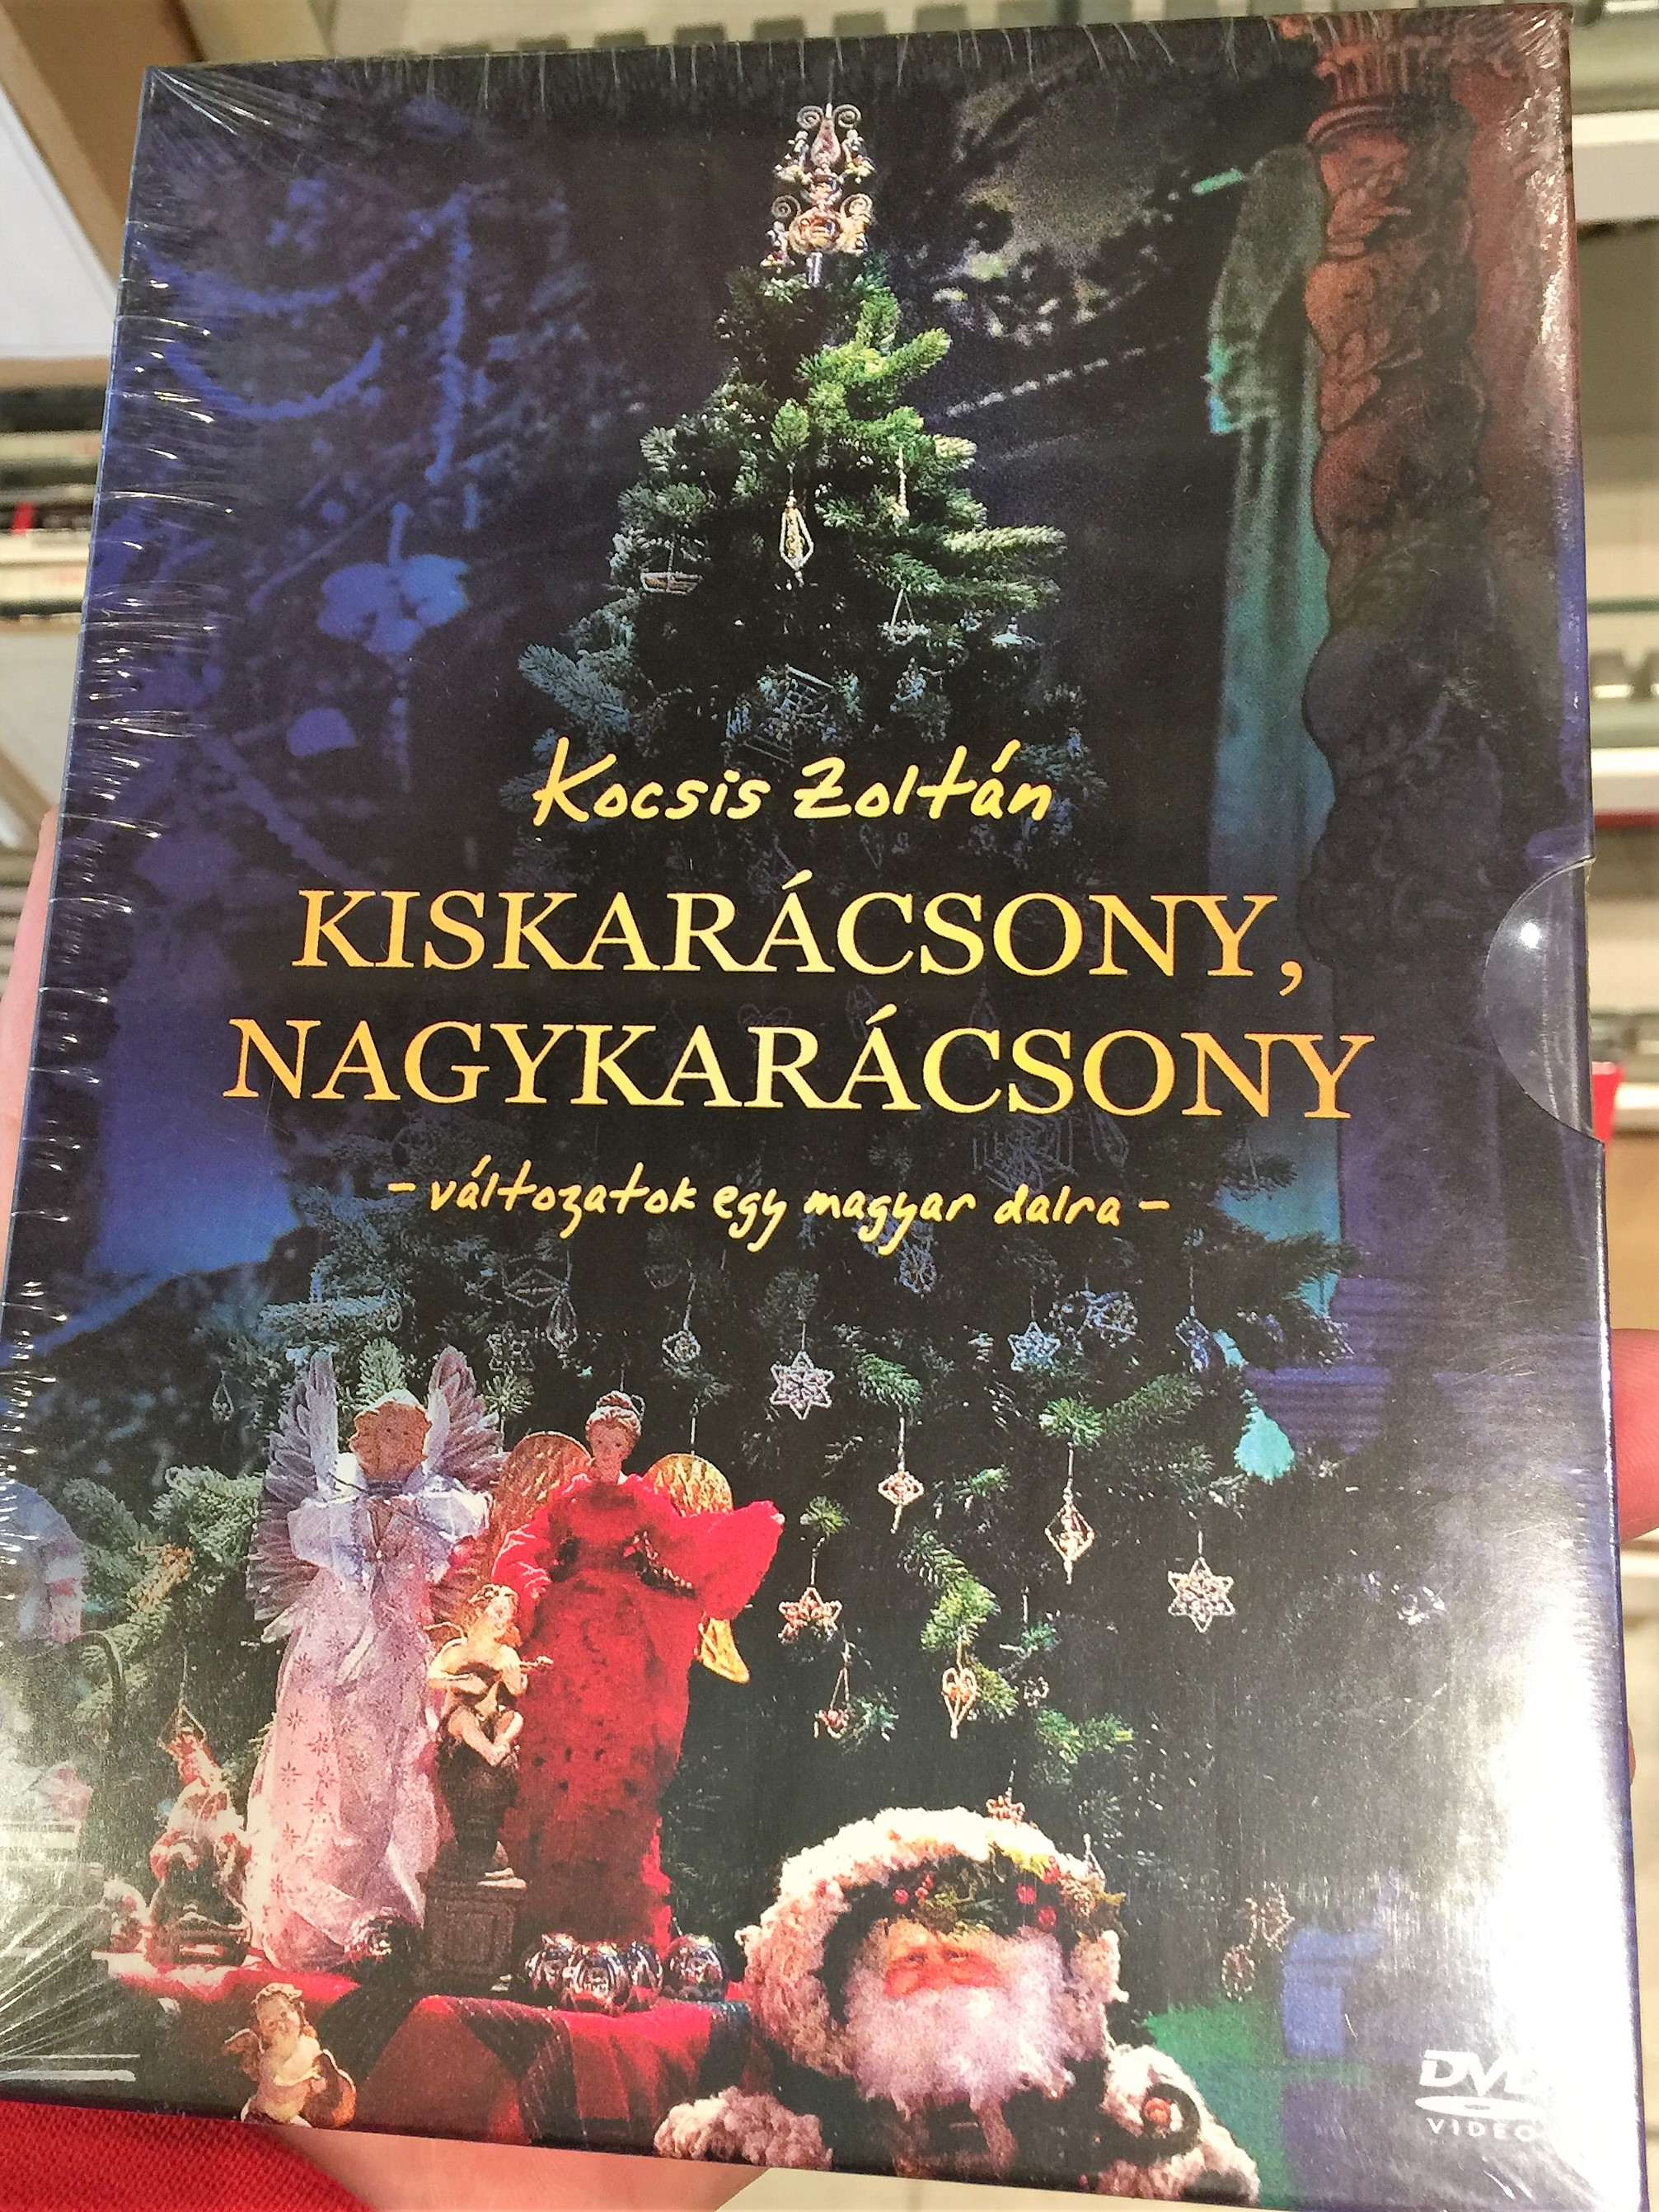 kocsis-zolt-n-kiskar-csony-nagykar-csony-dvd-2010-v-ltozatok-egy-magyar-dalra-variations-on-a-hungarian-song-national-philharmonic-orchestra-hungary-directed-by-kocsis-zolt-n-1-.jpg